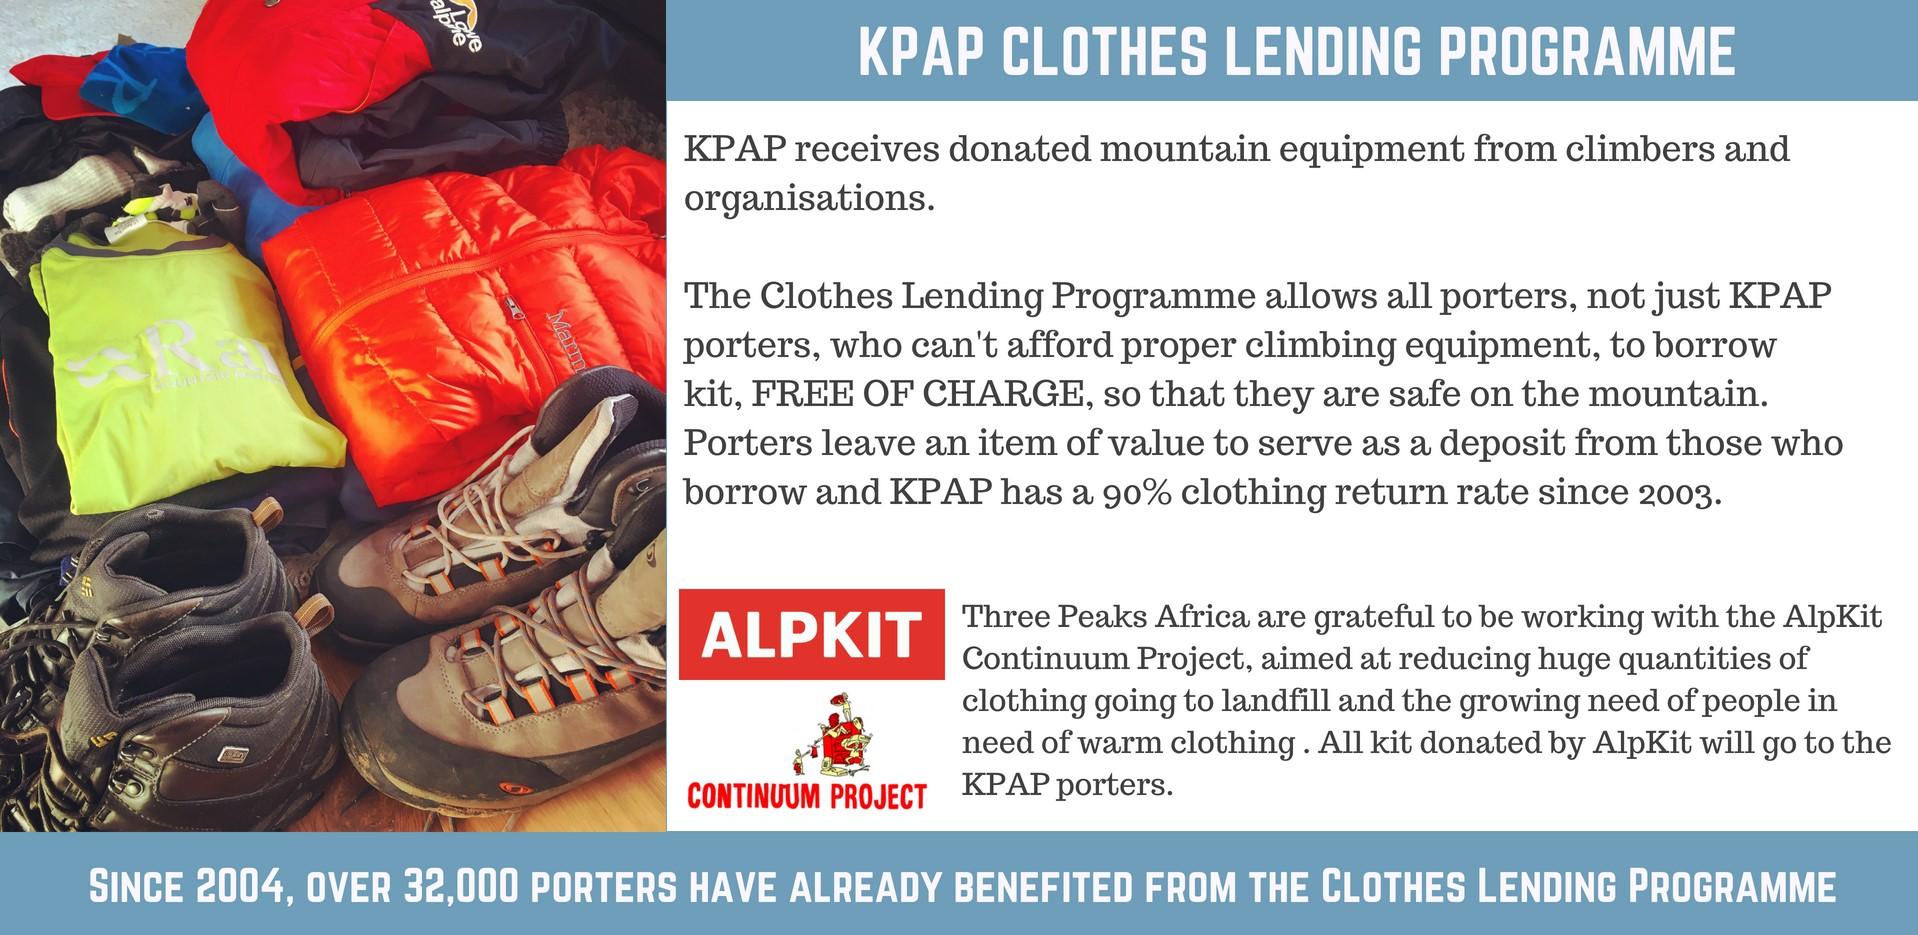 KPAP Clothes Lending Programme2.jpg